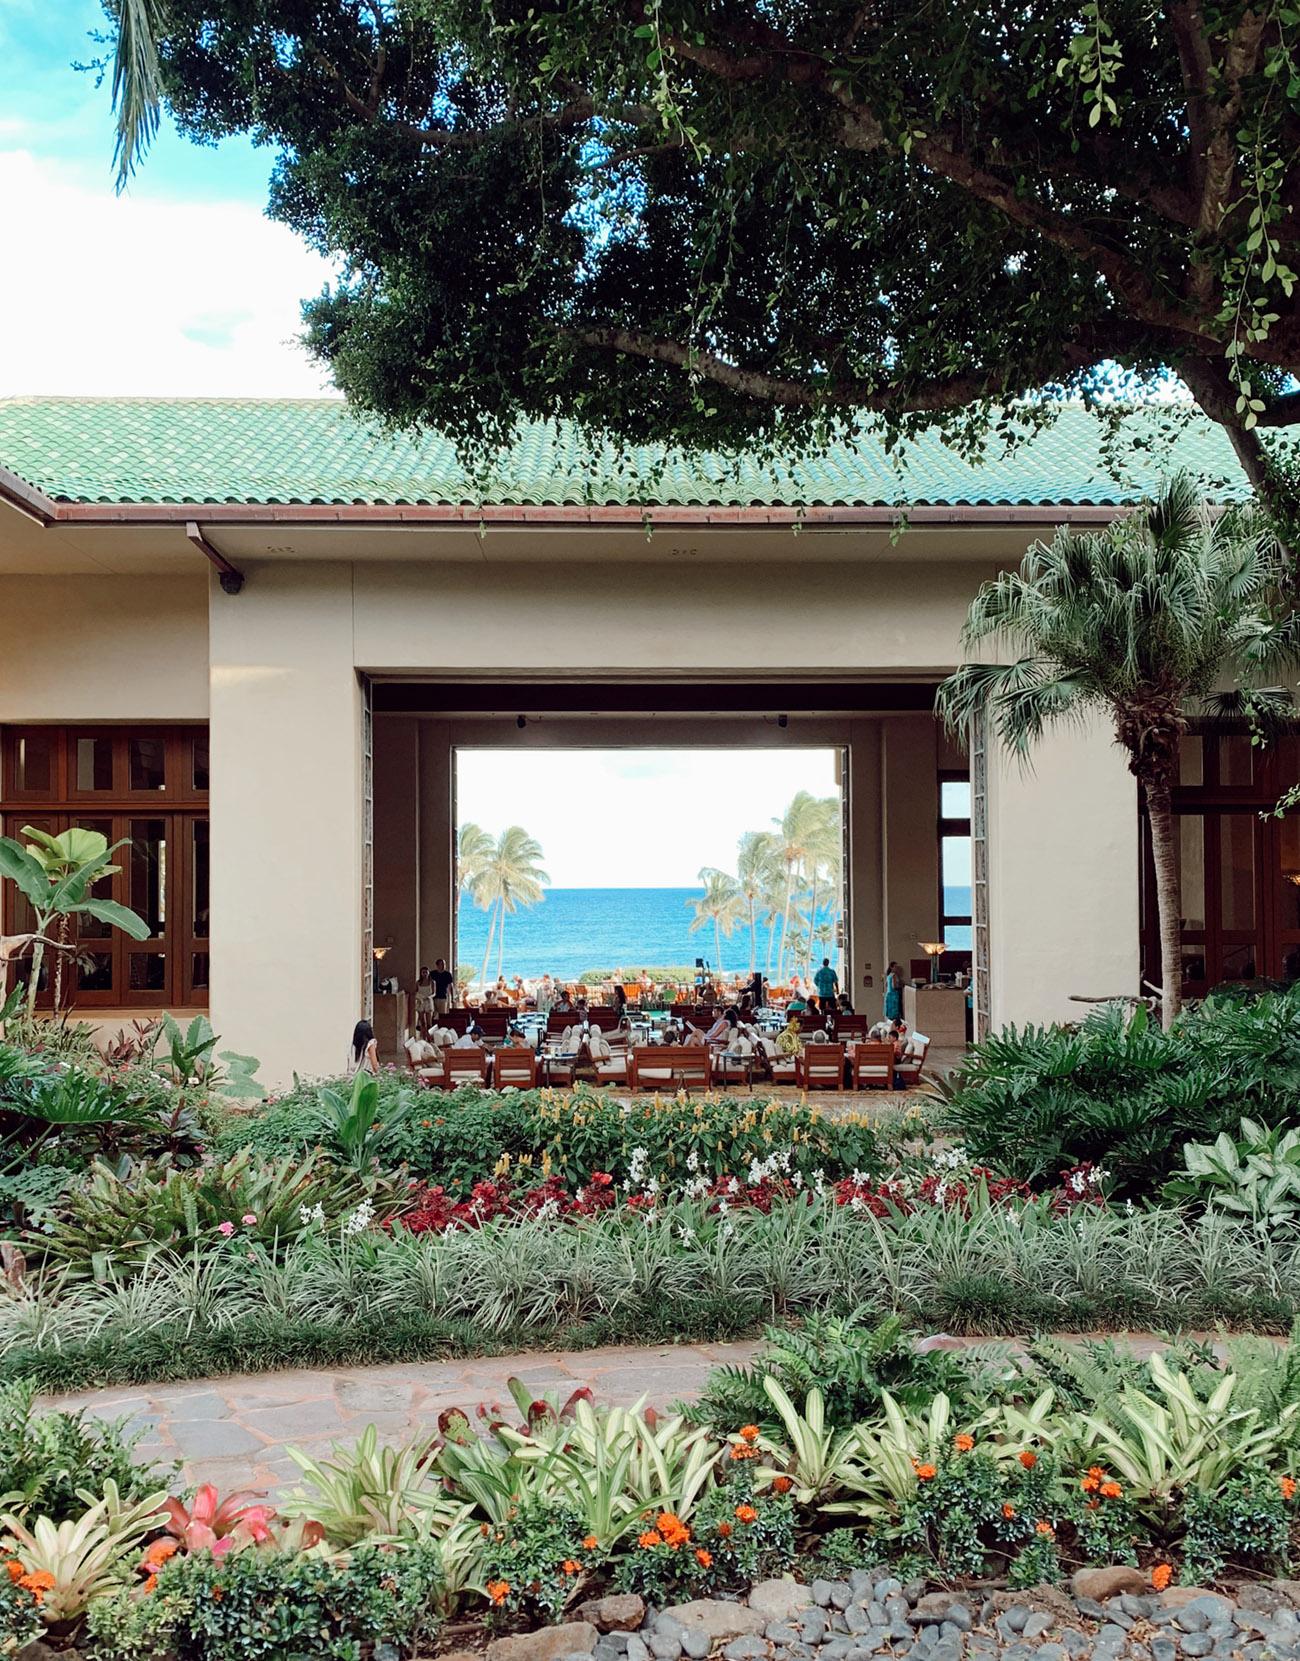 Grand Hyatt Resort & Spa in Kauai